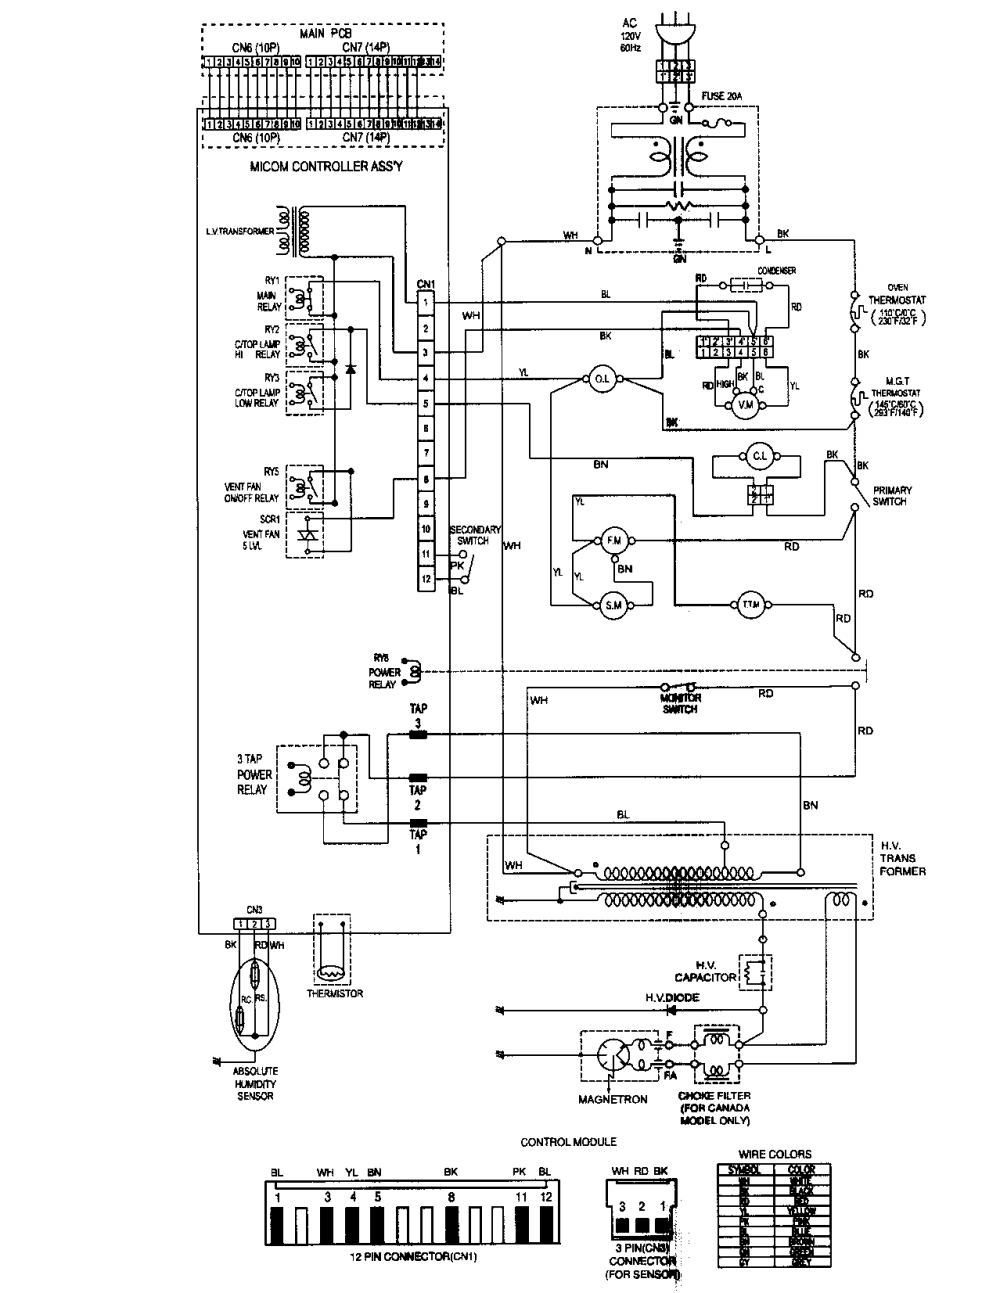 medium resolution of lg stove top wiring diagram electrical wiring diagrams wiring diagram for ge jgp970 gas cooktop